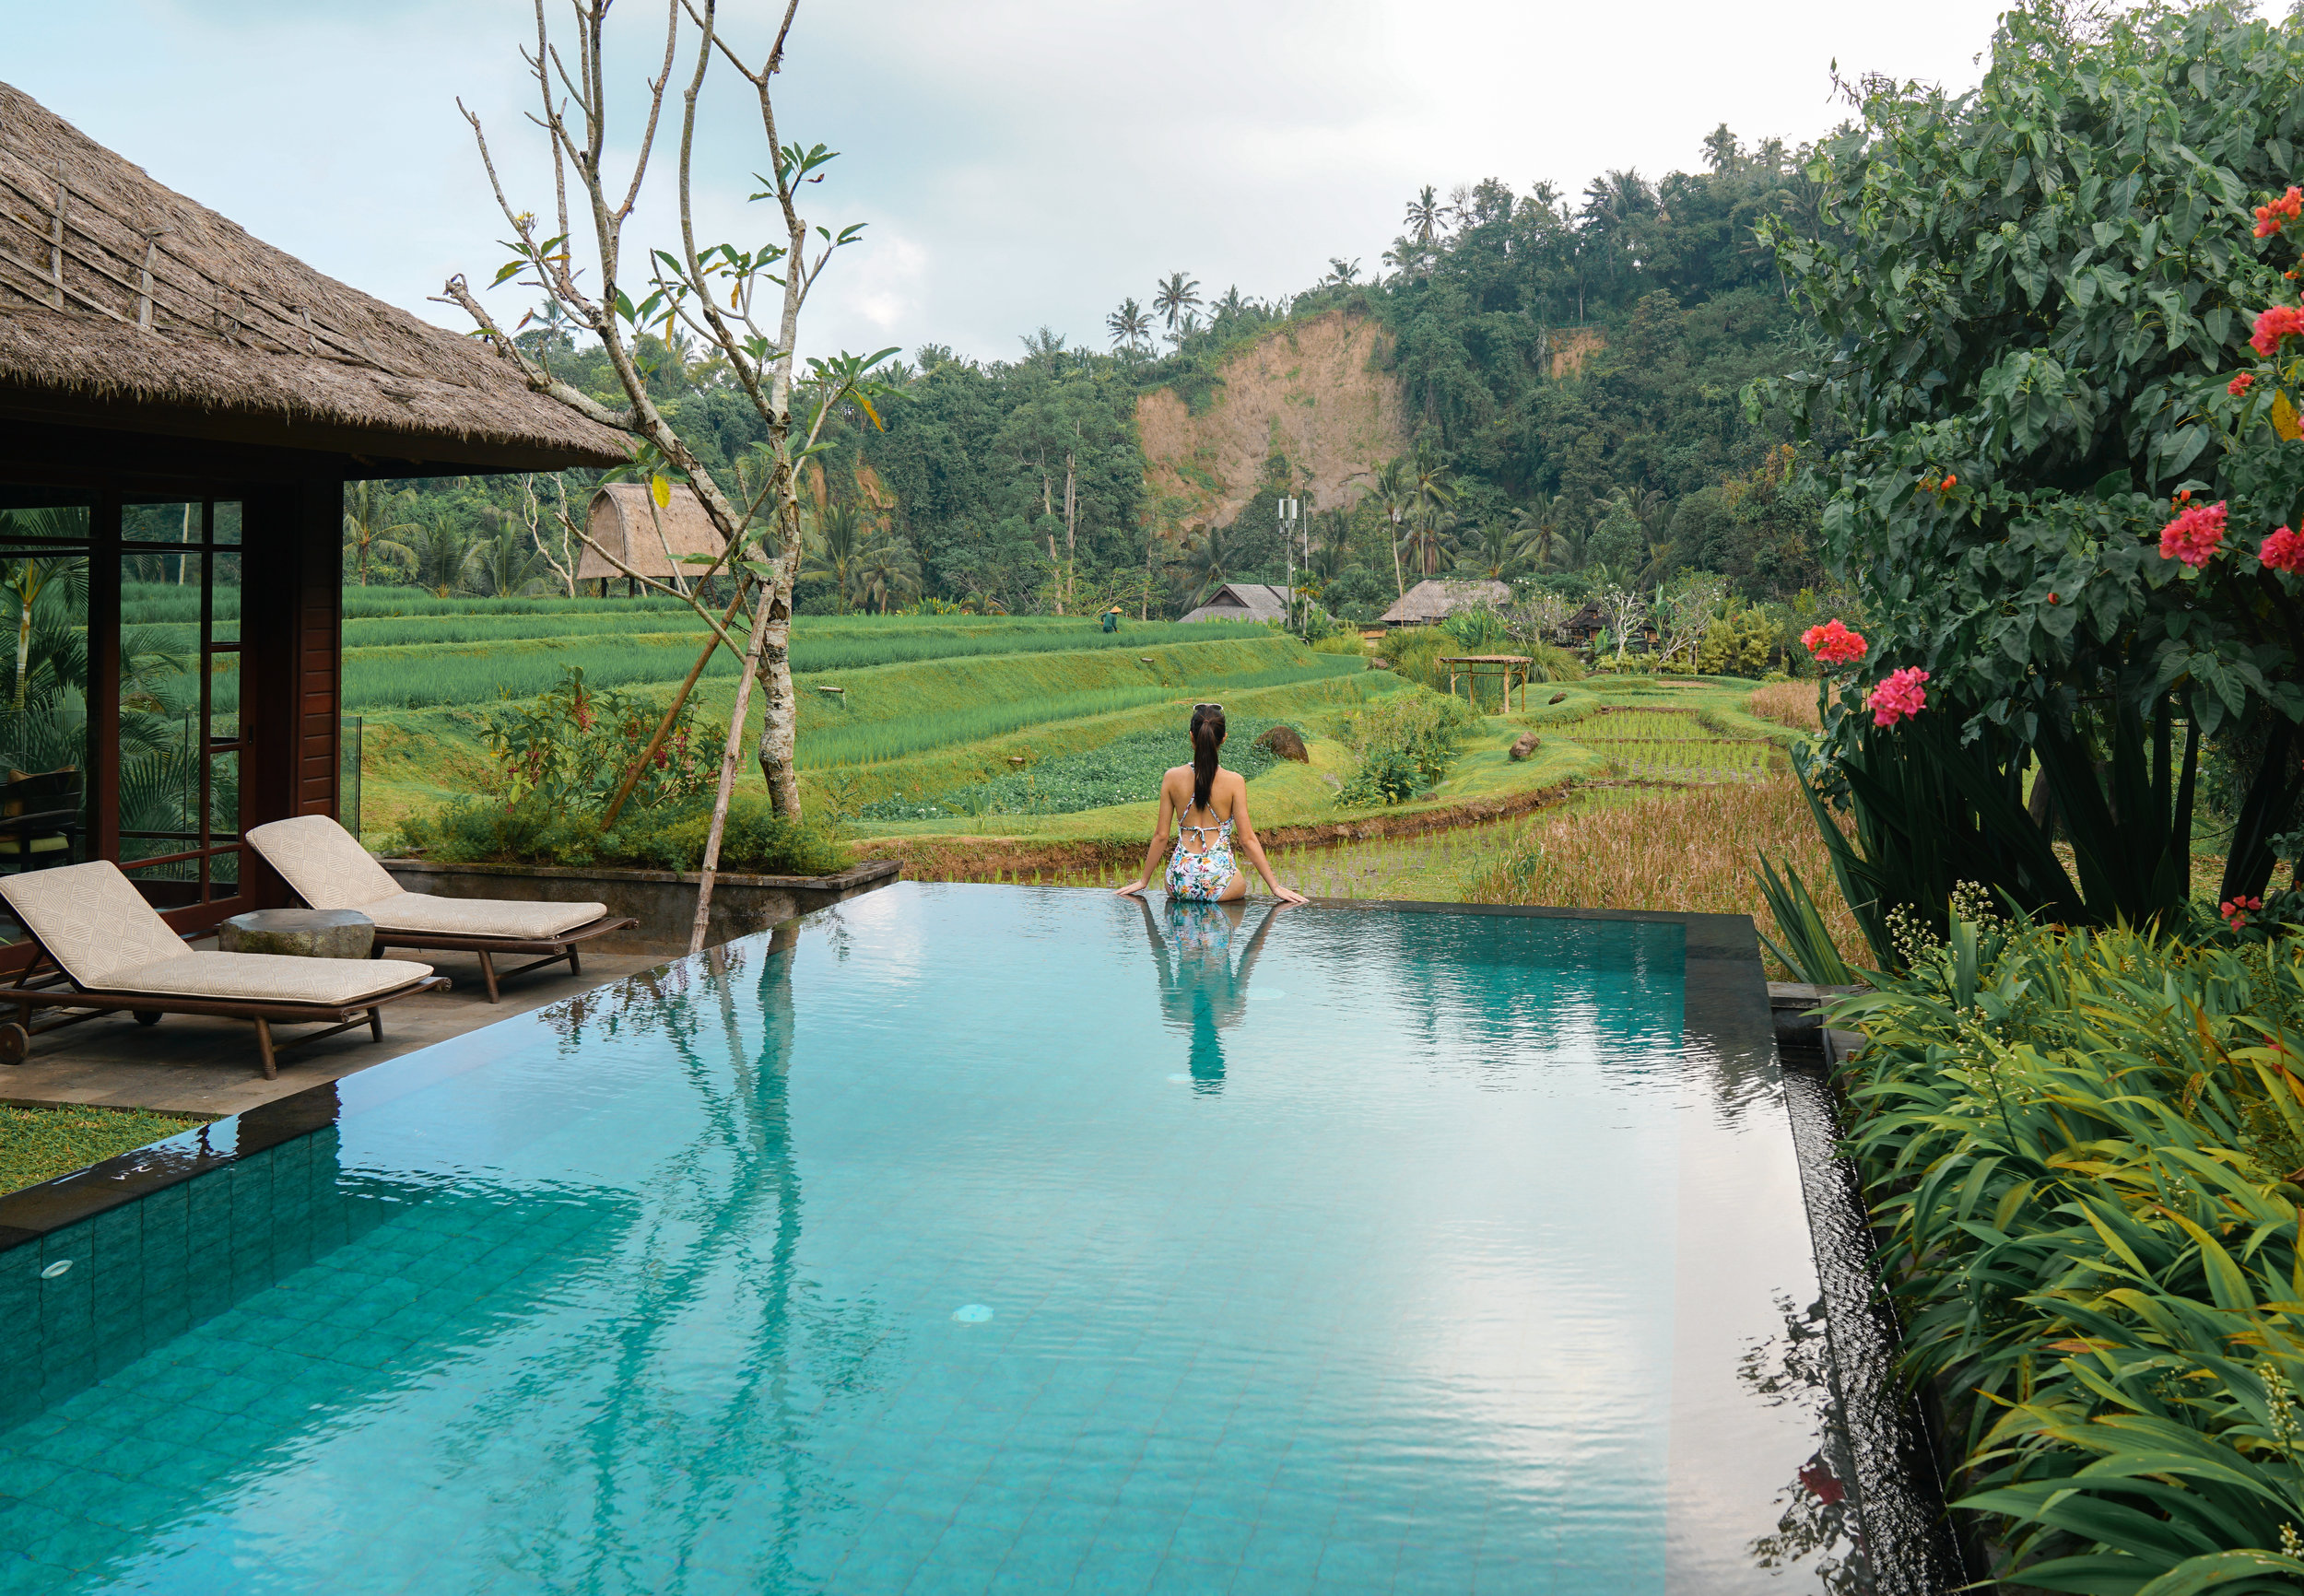 one of my favorite villas in bali - Mandapa, A Ritz-Carlton Reserve